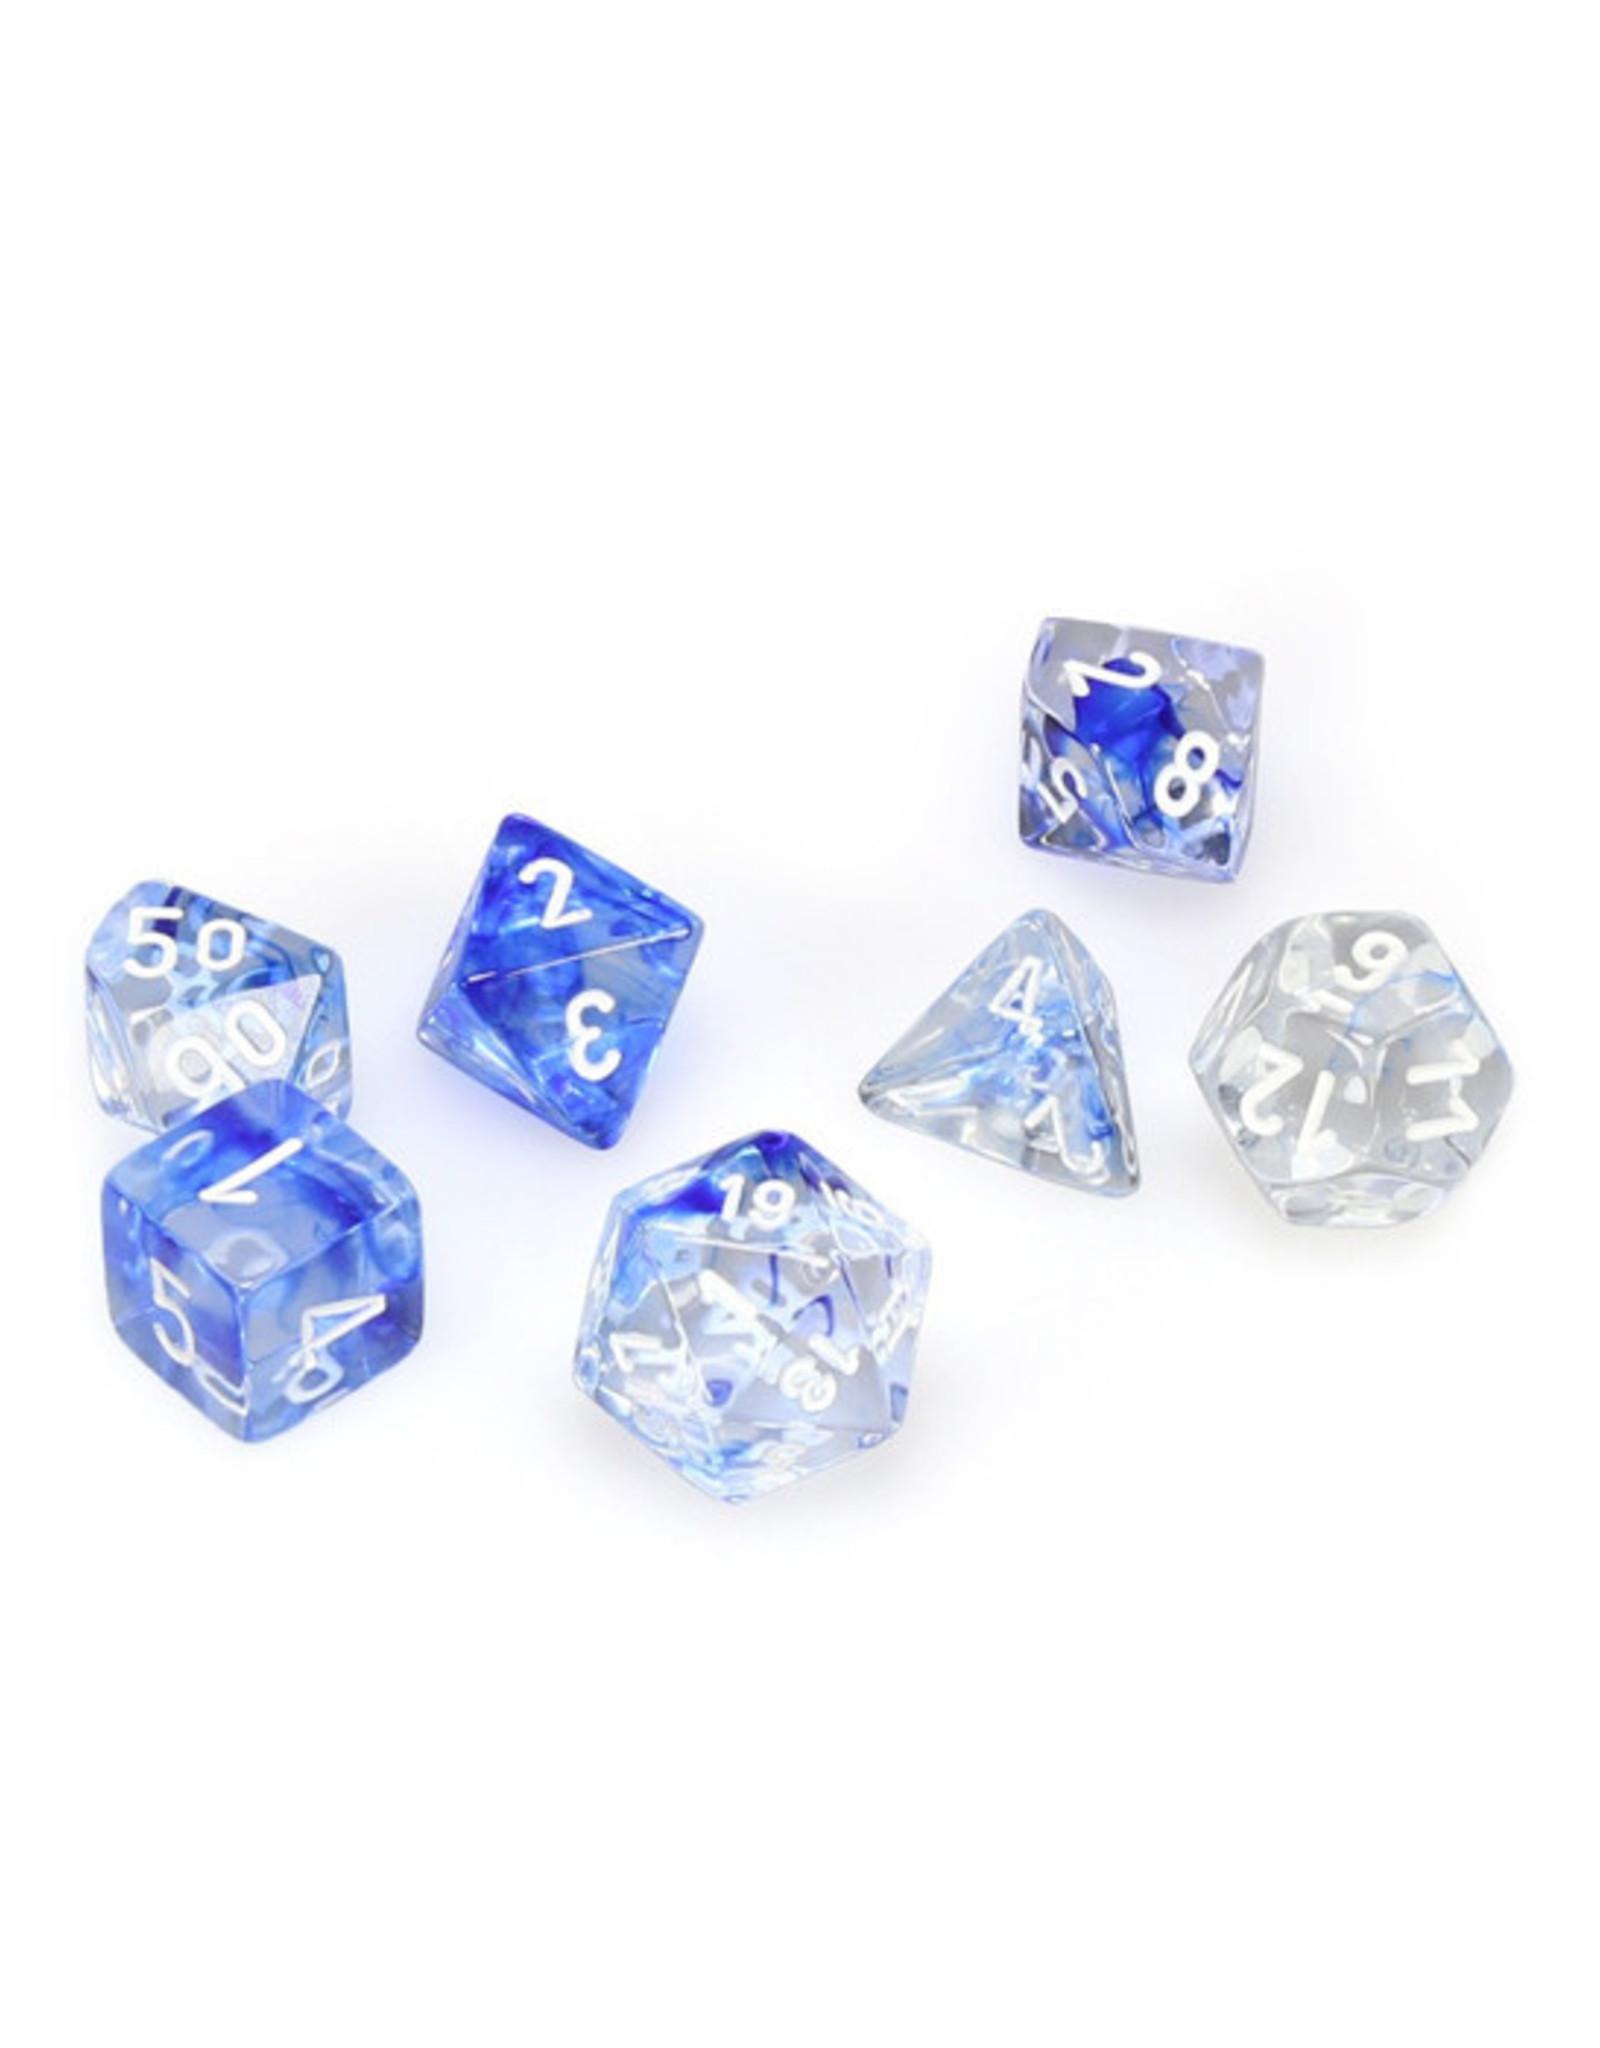 Chessex Chessex: Poly 7 Set - Nebula - Dark Blue w/ White